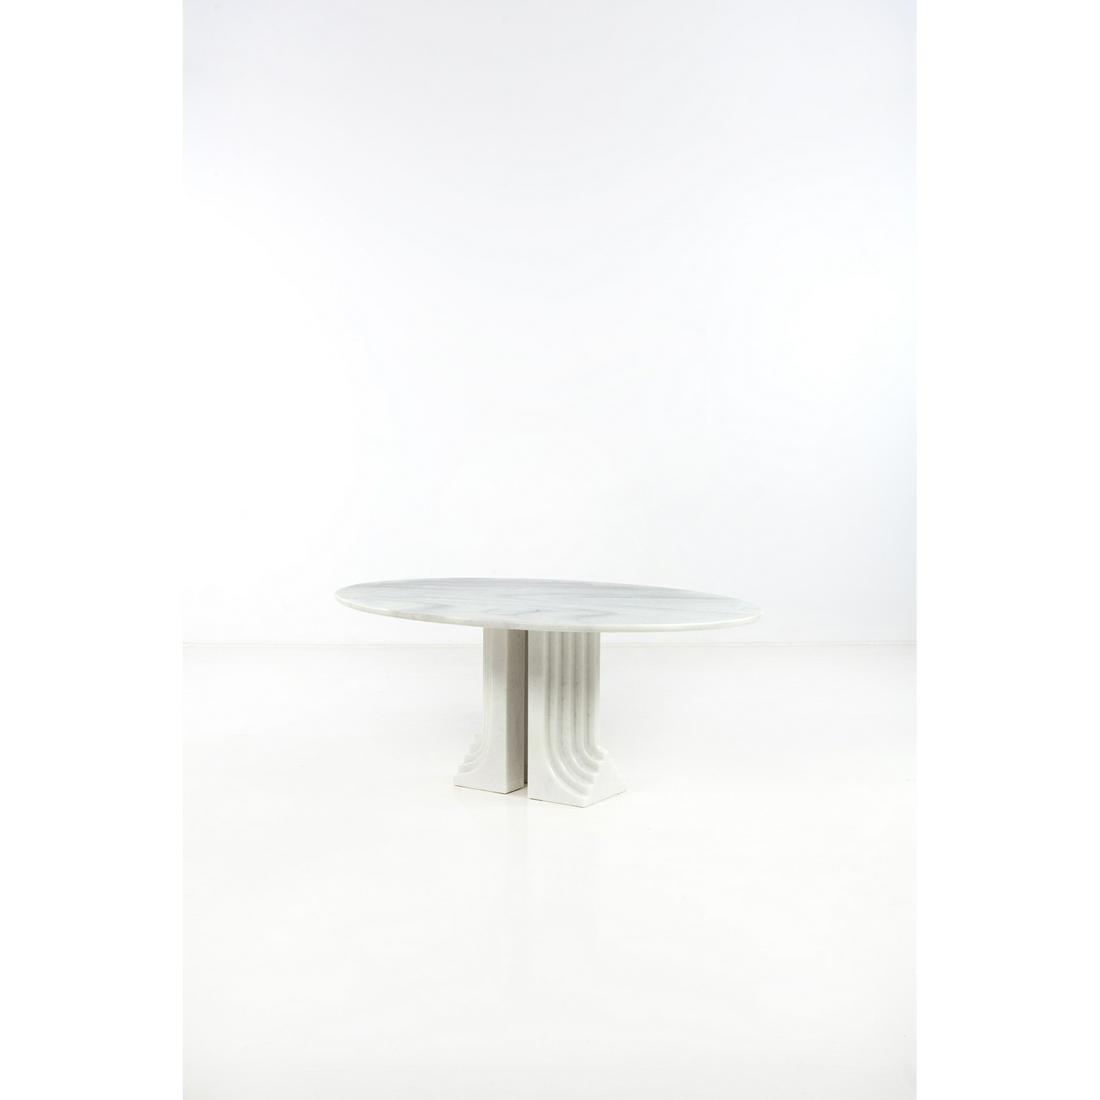 Carlo Scarpa (1906-1978) Samo Table Marble Creation